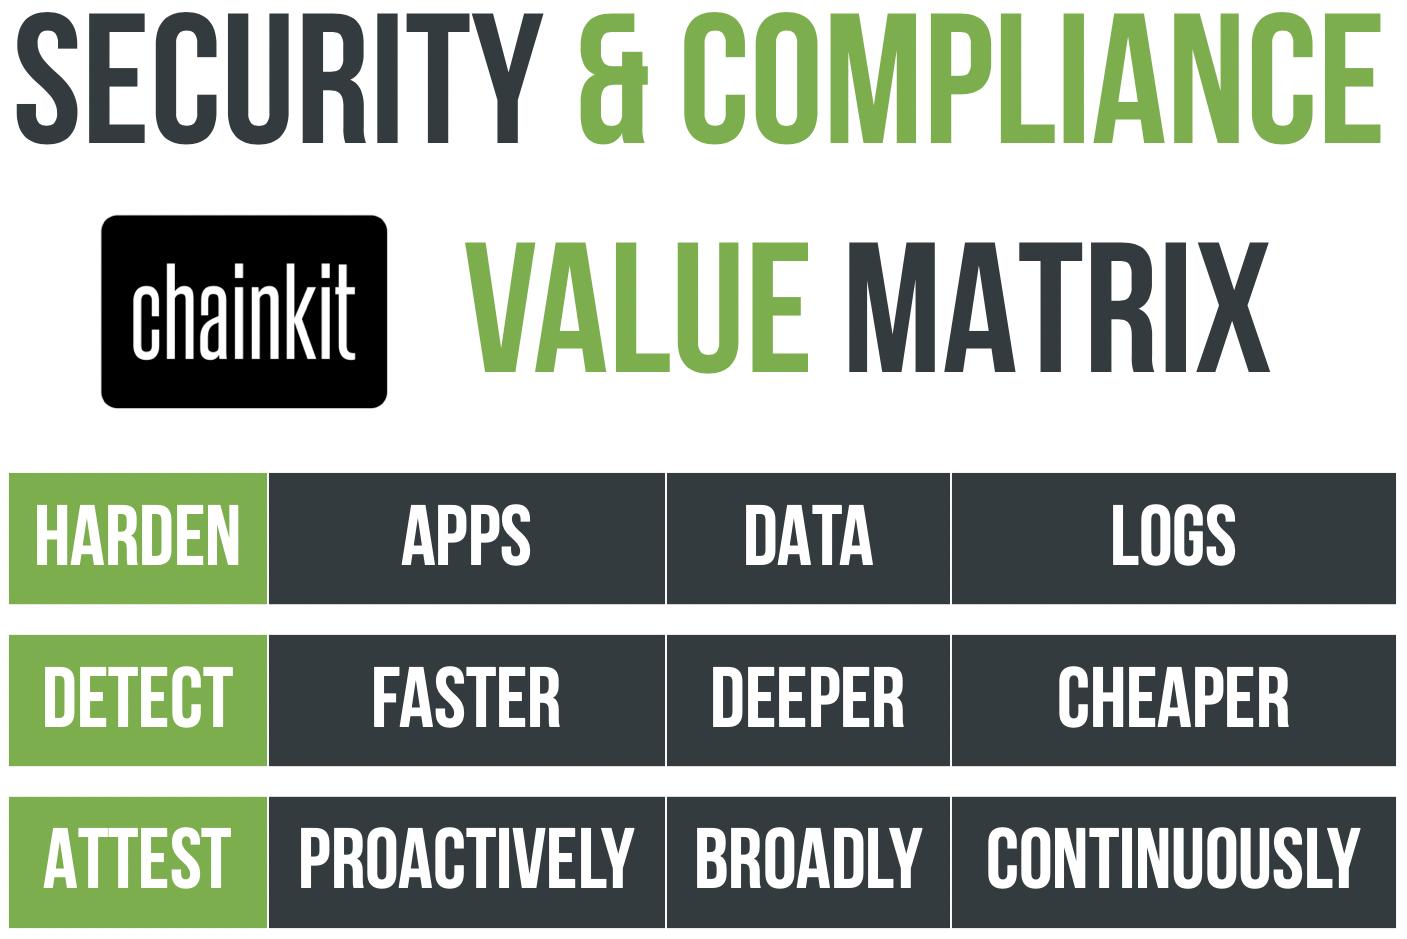 Chainkit Value Matrix - Security & Compliance.png